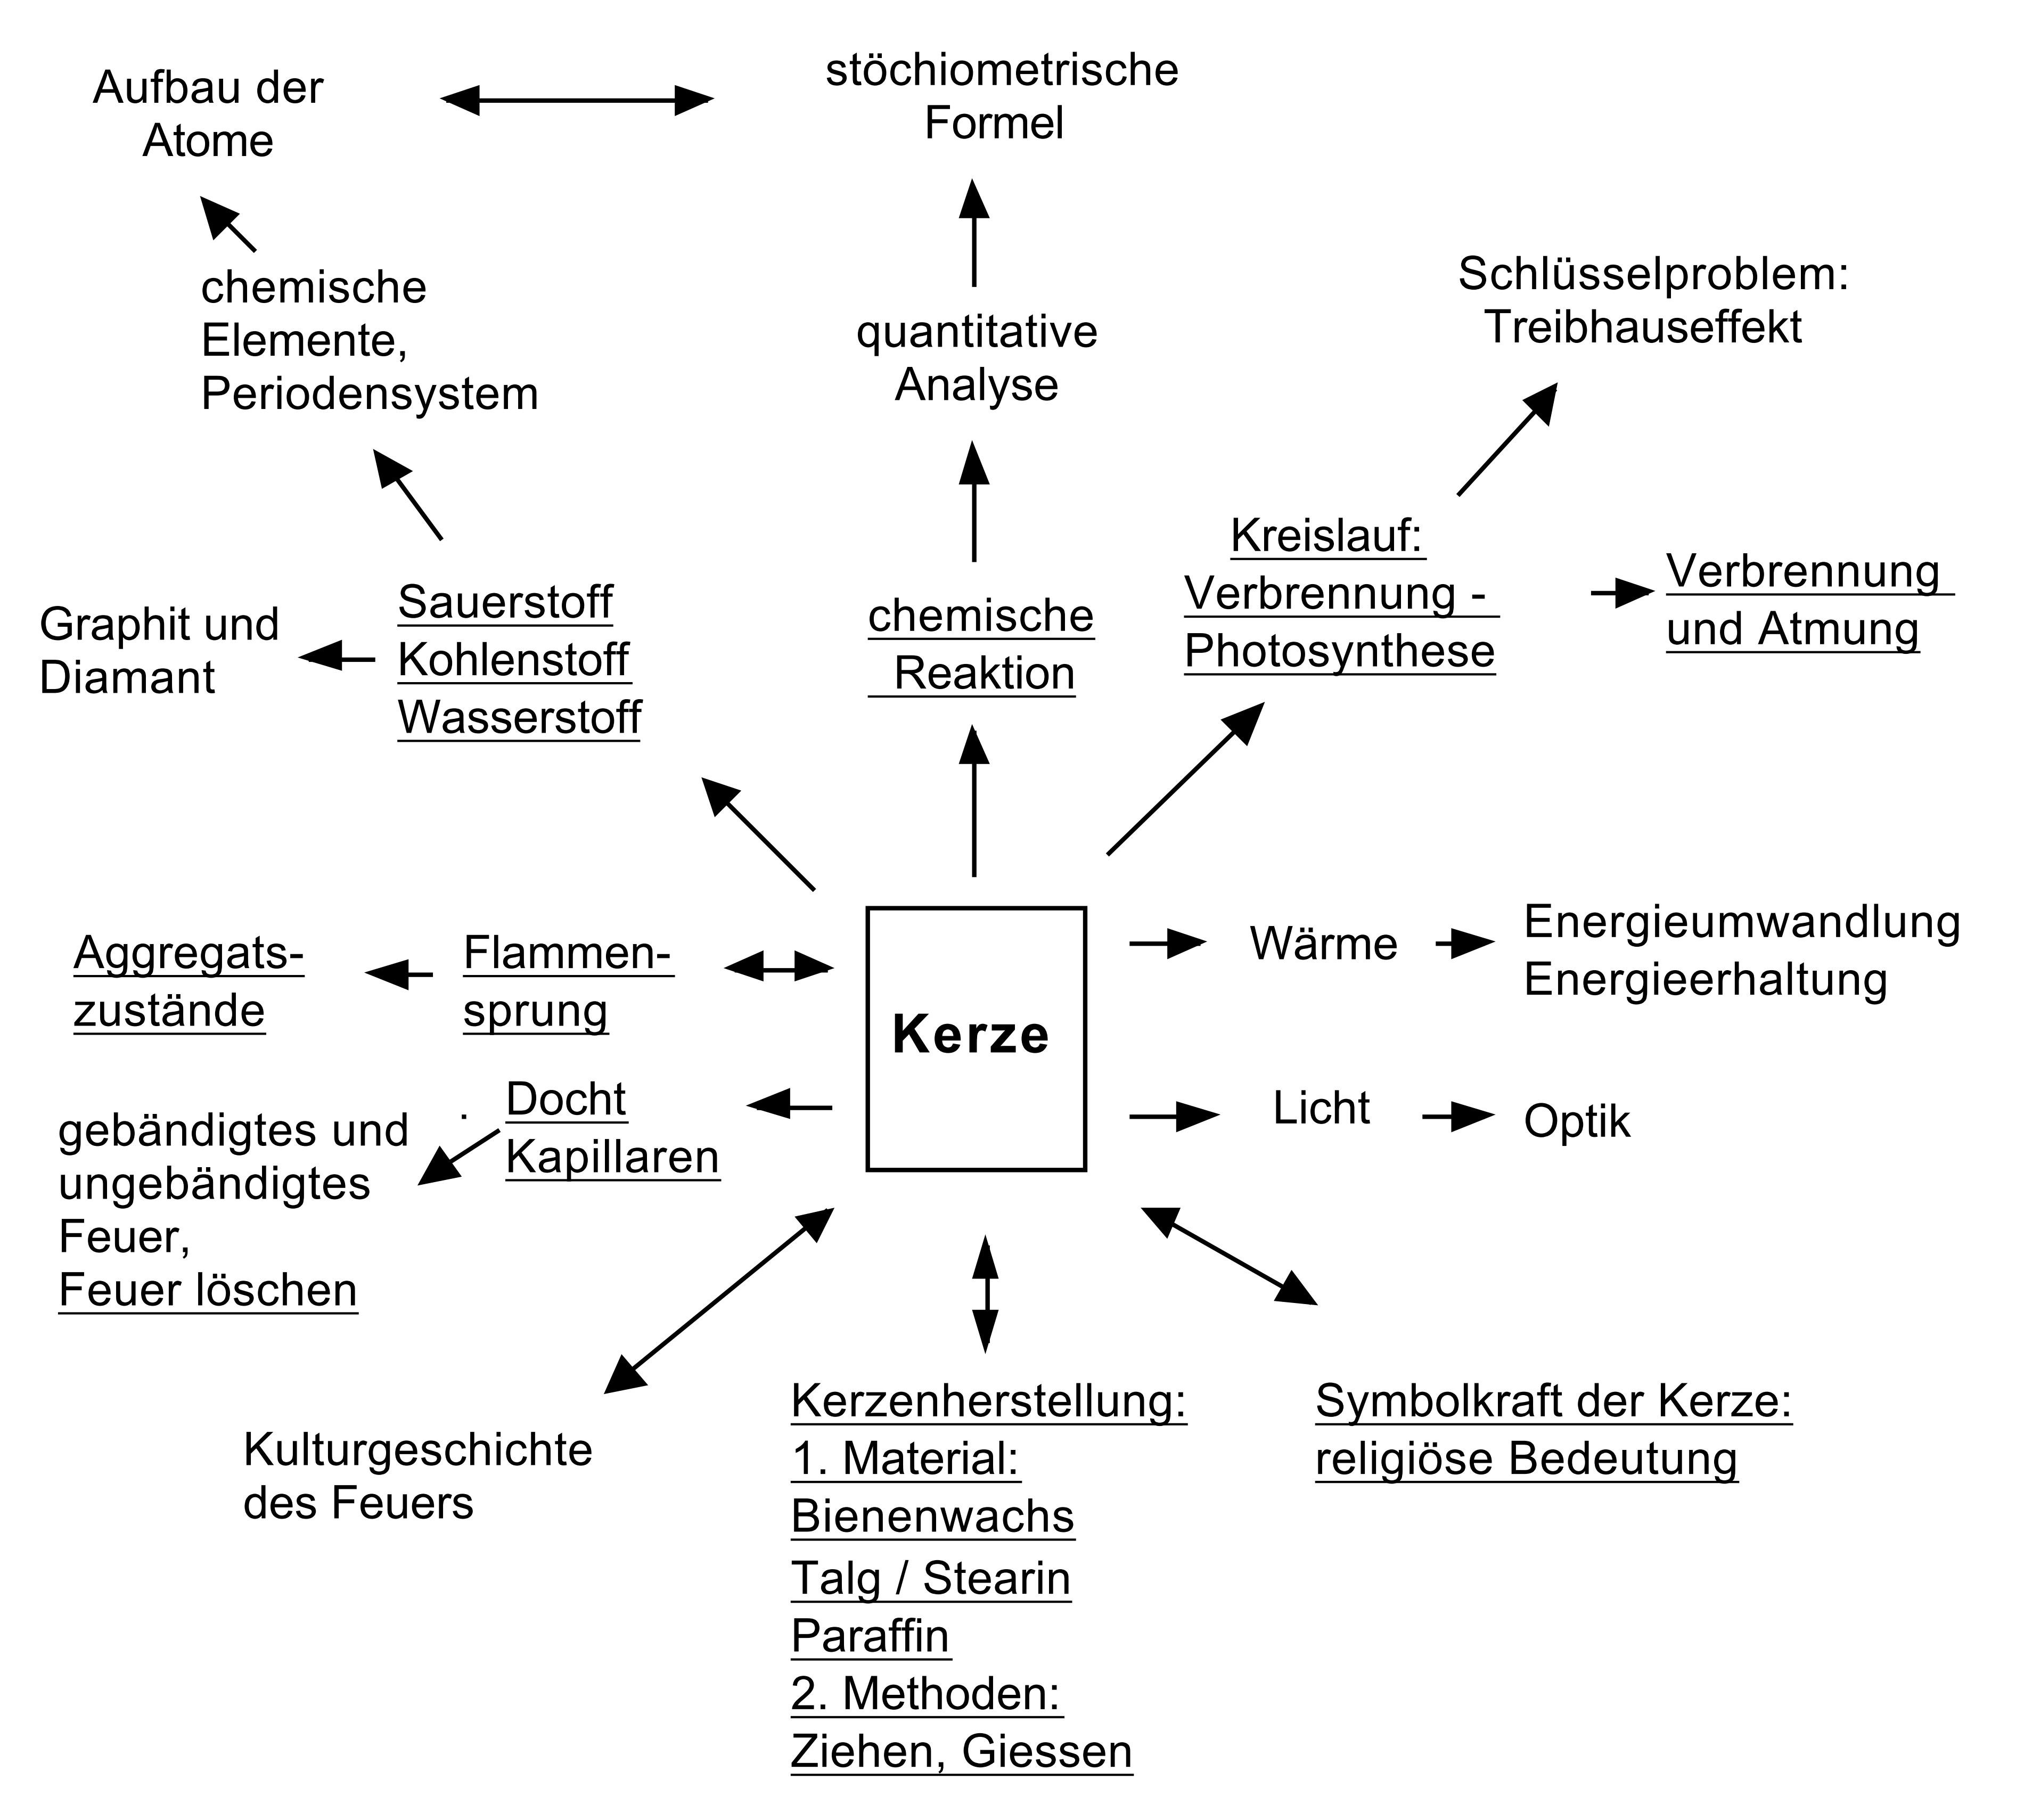 Wunderbar Kleinhirnwurms Anatomie Galerie - Anatomie Ideen - finotti ...